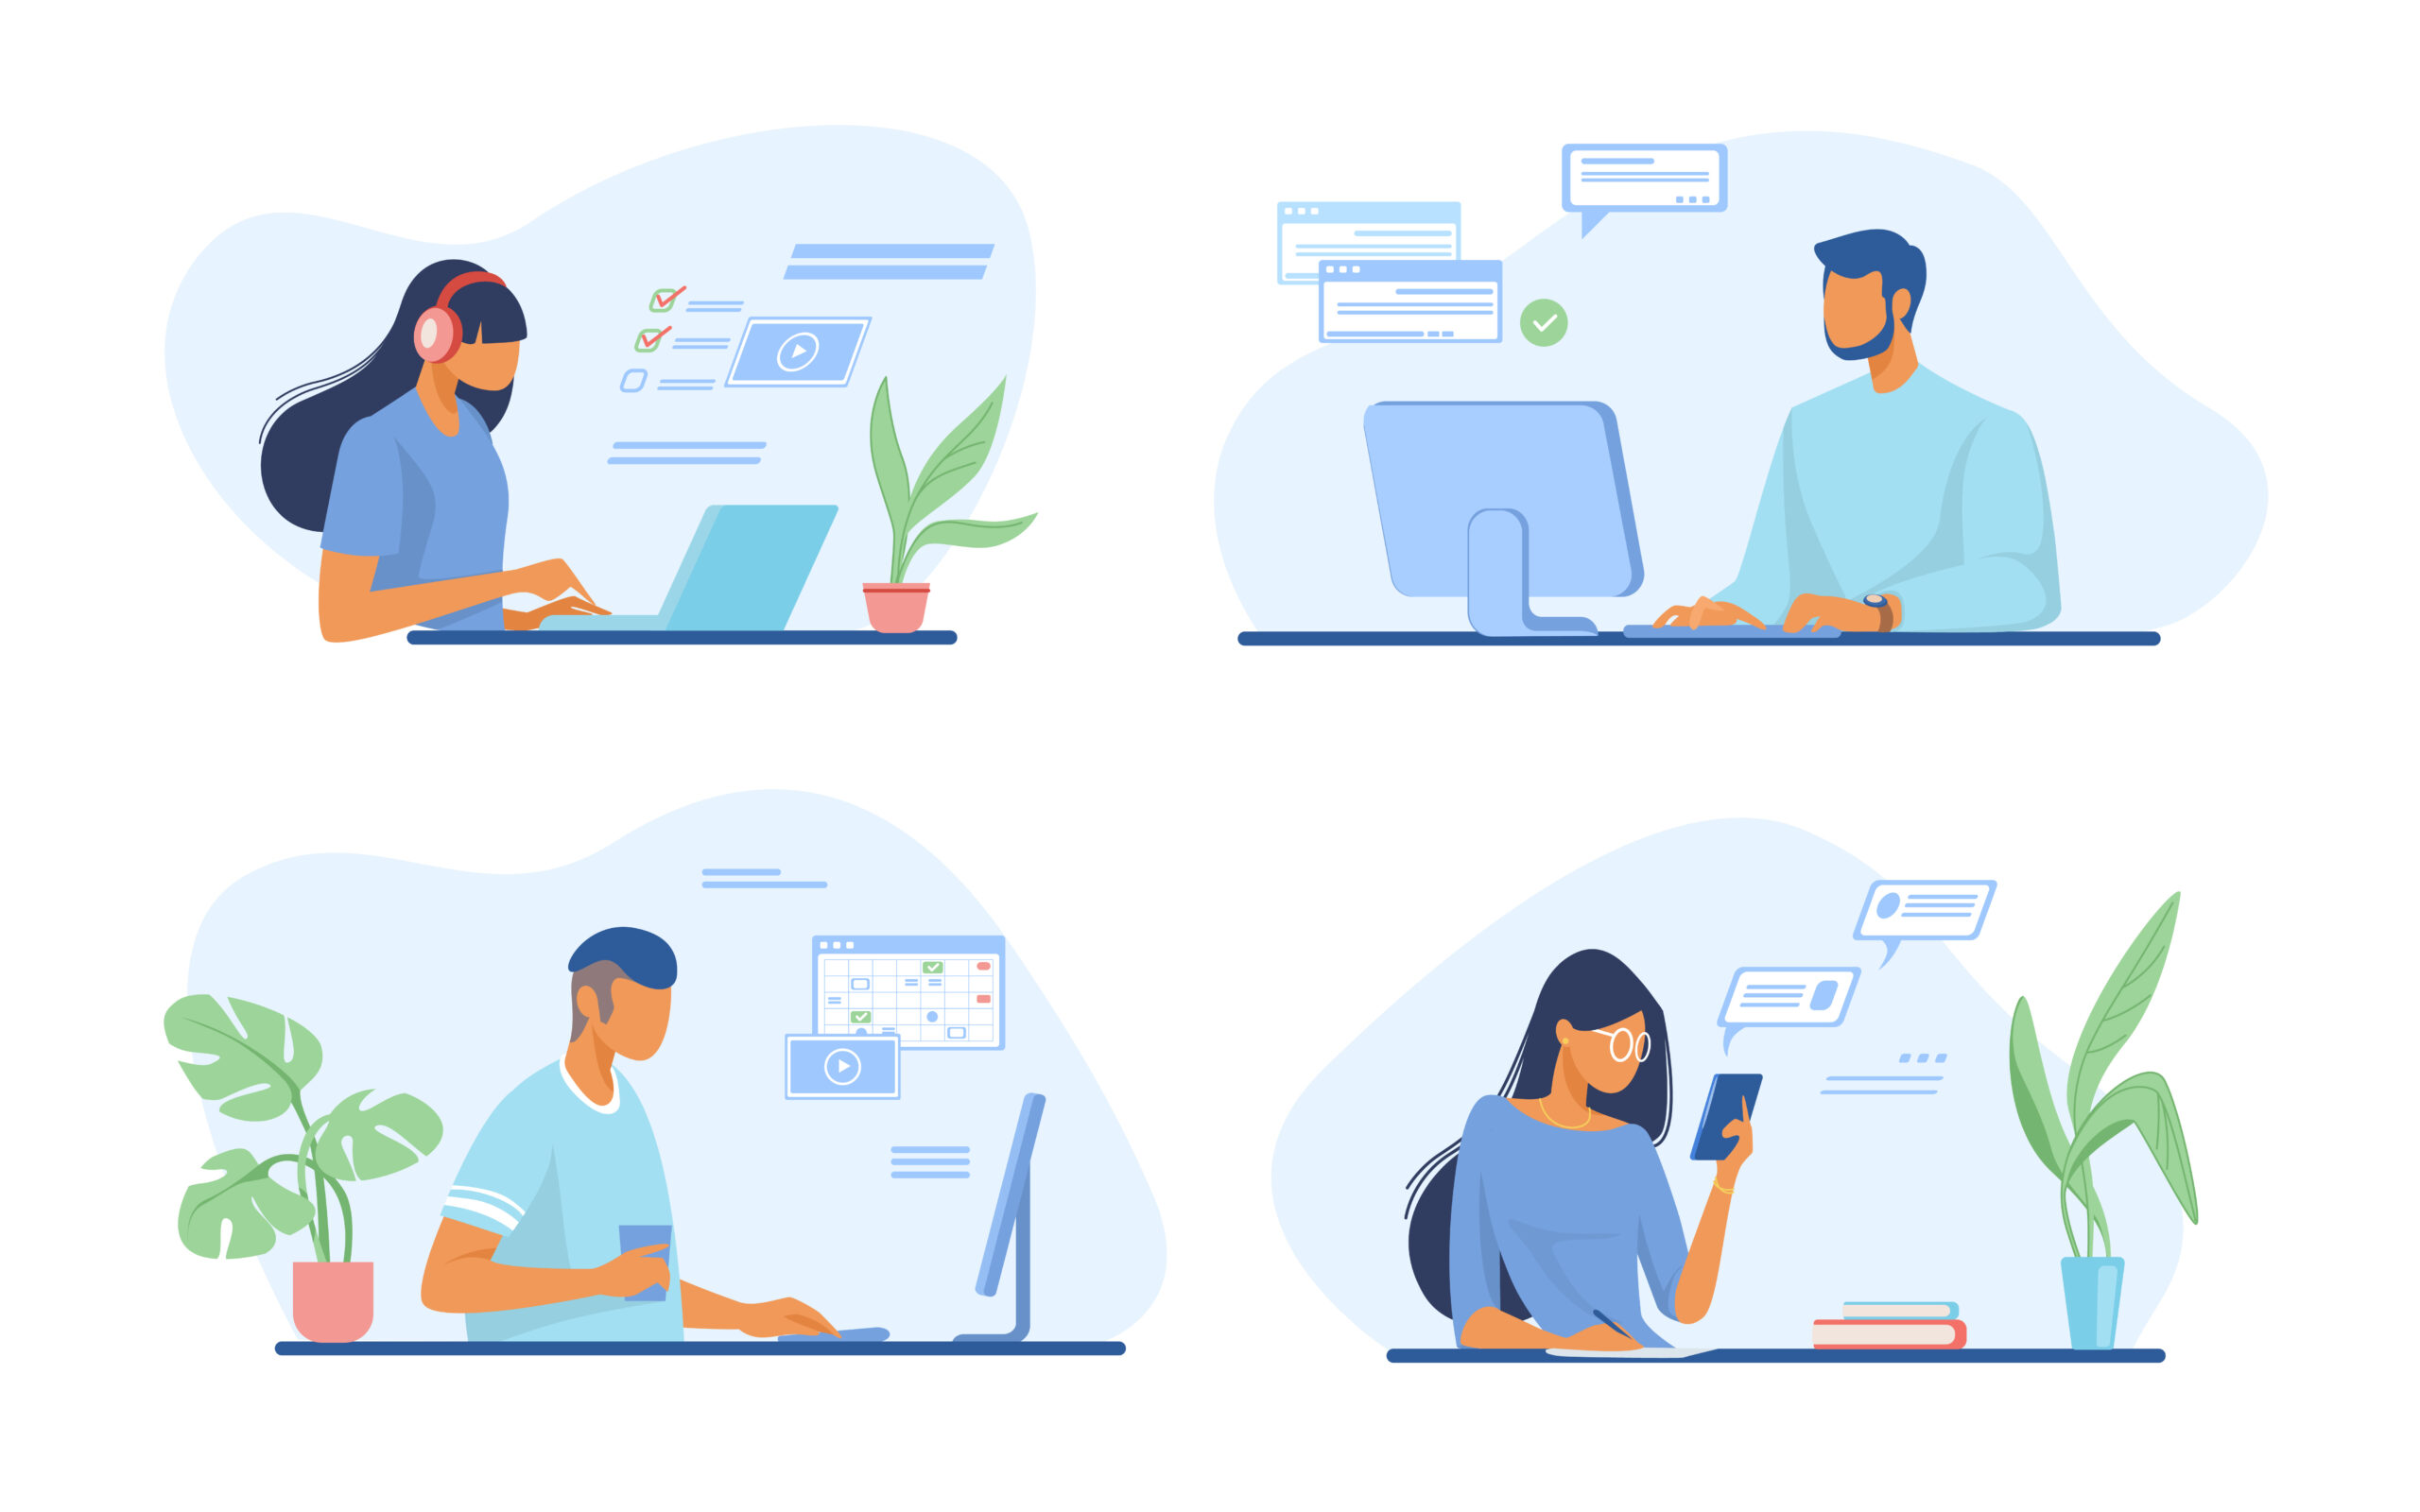 Incremento-redes-sociales-movil-laptop-lima-perú